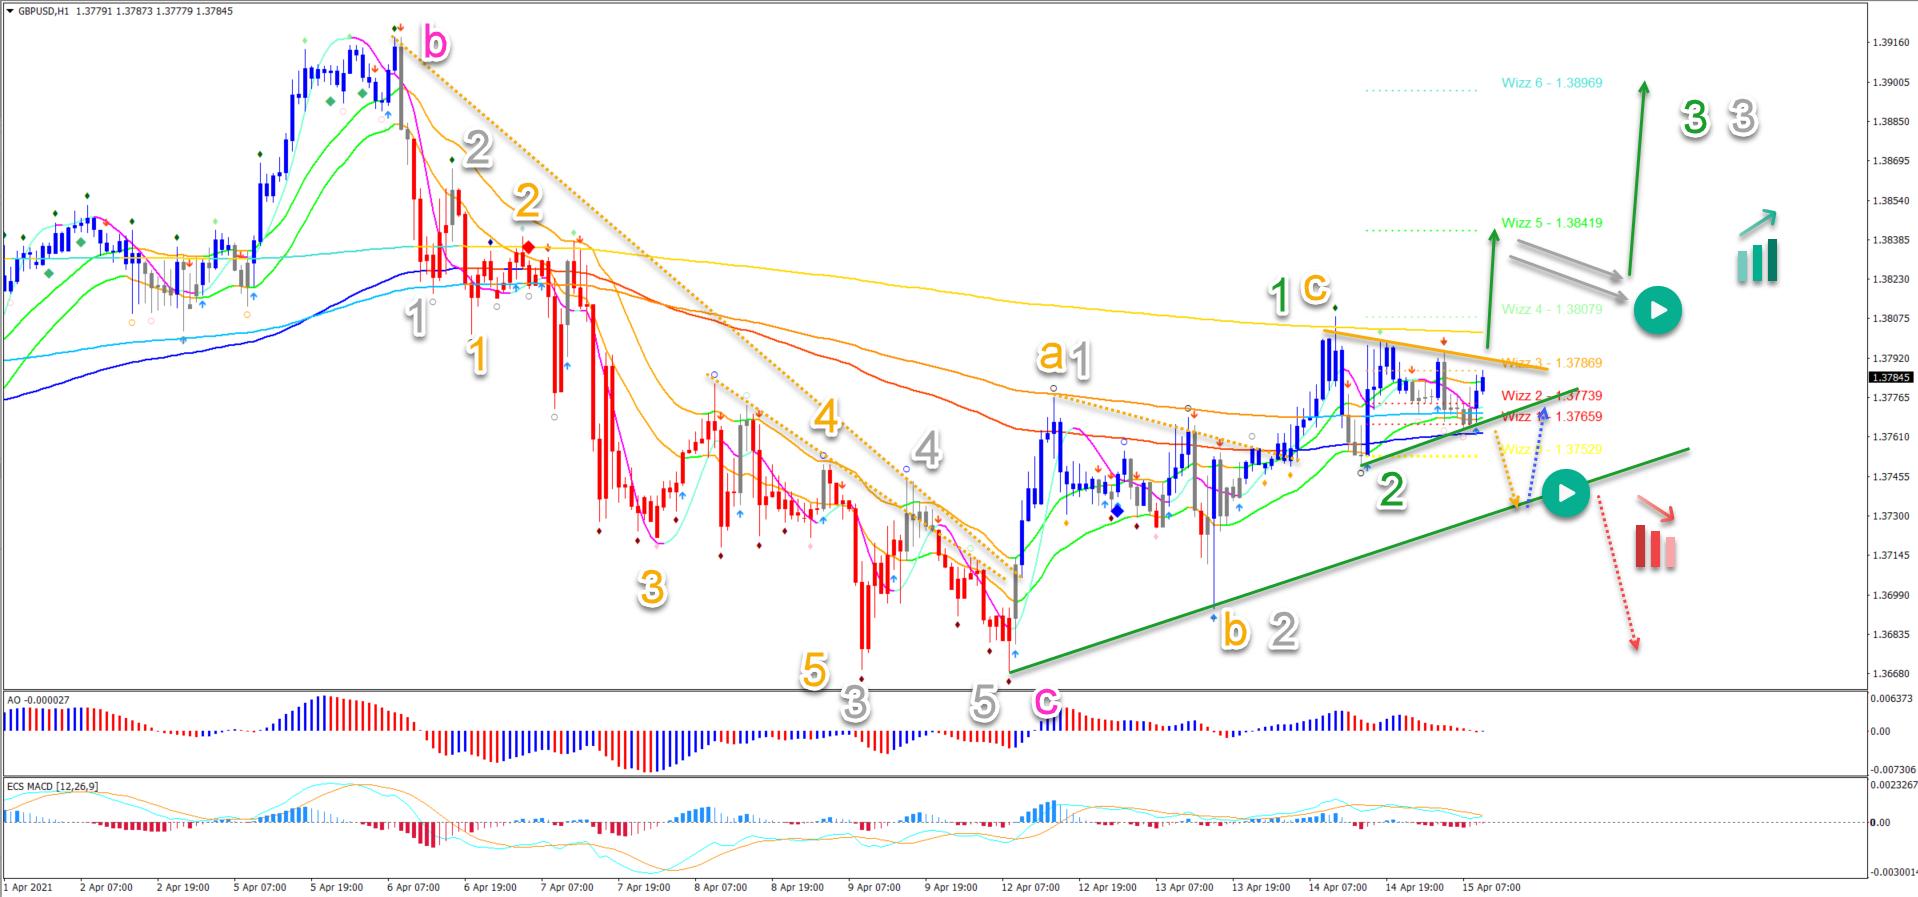 GBP/USD 15.04.2021 1 hour chart